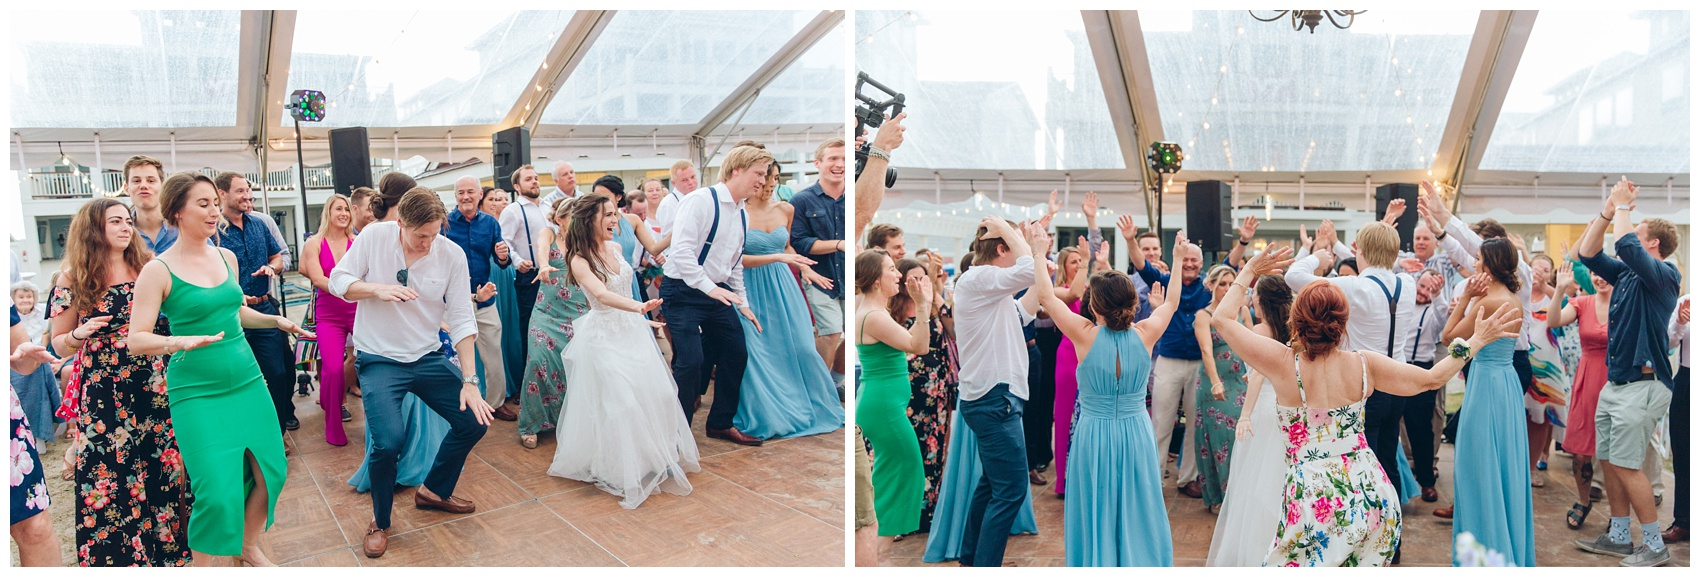 Outer-Banks-Corolla-Wedding_0115.jpg